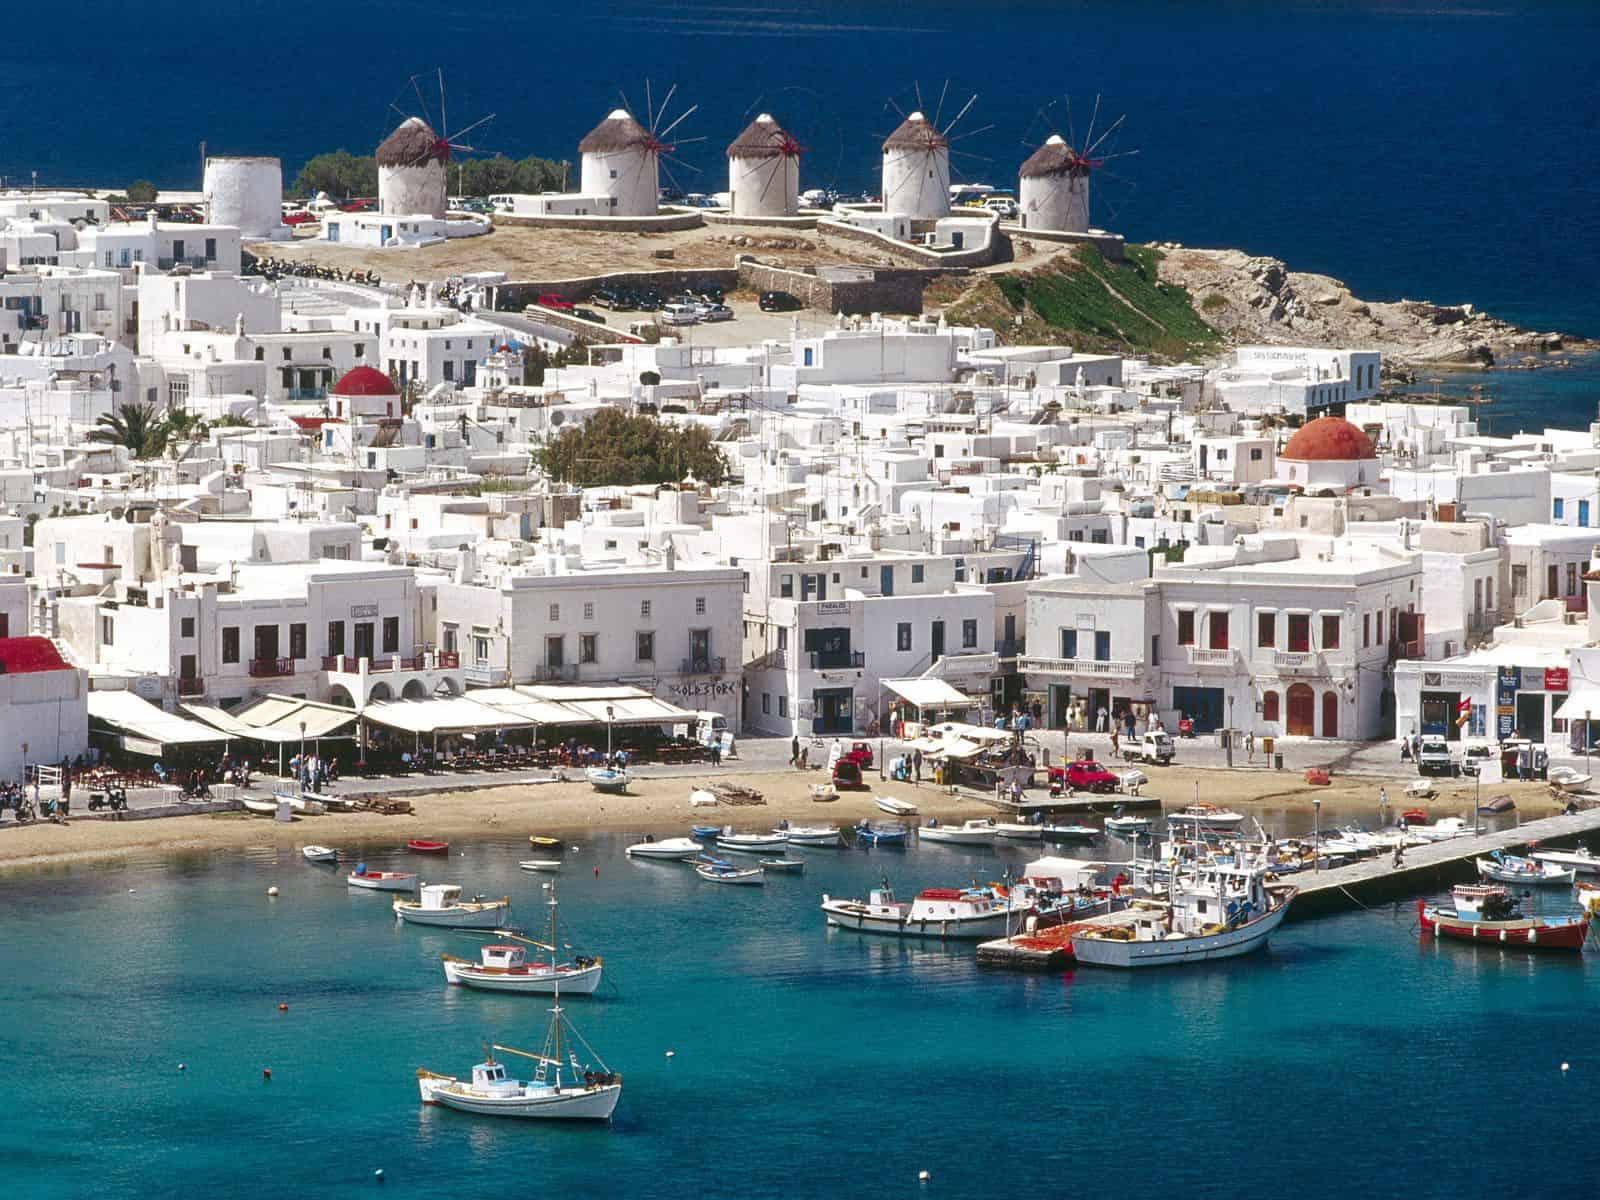 71d371a9bb197 أثينا سياحة وترفيه دليل متكامل للسياحة في اليونان - موسوعة